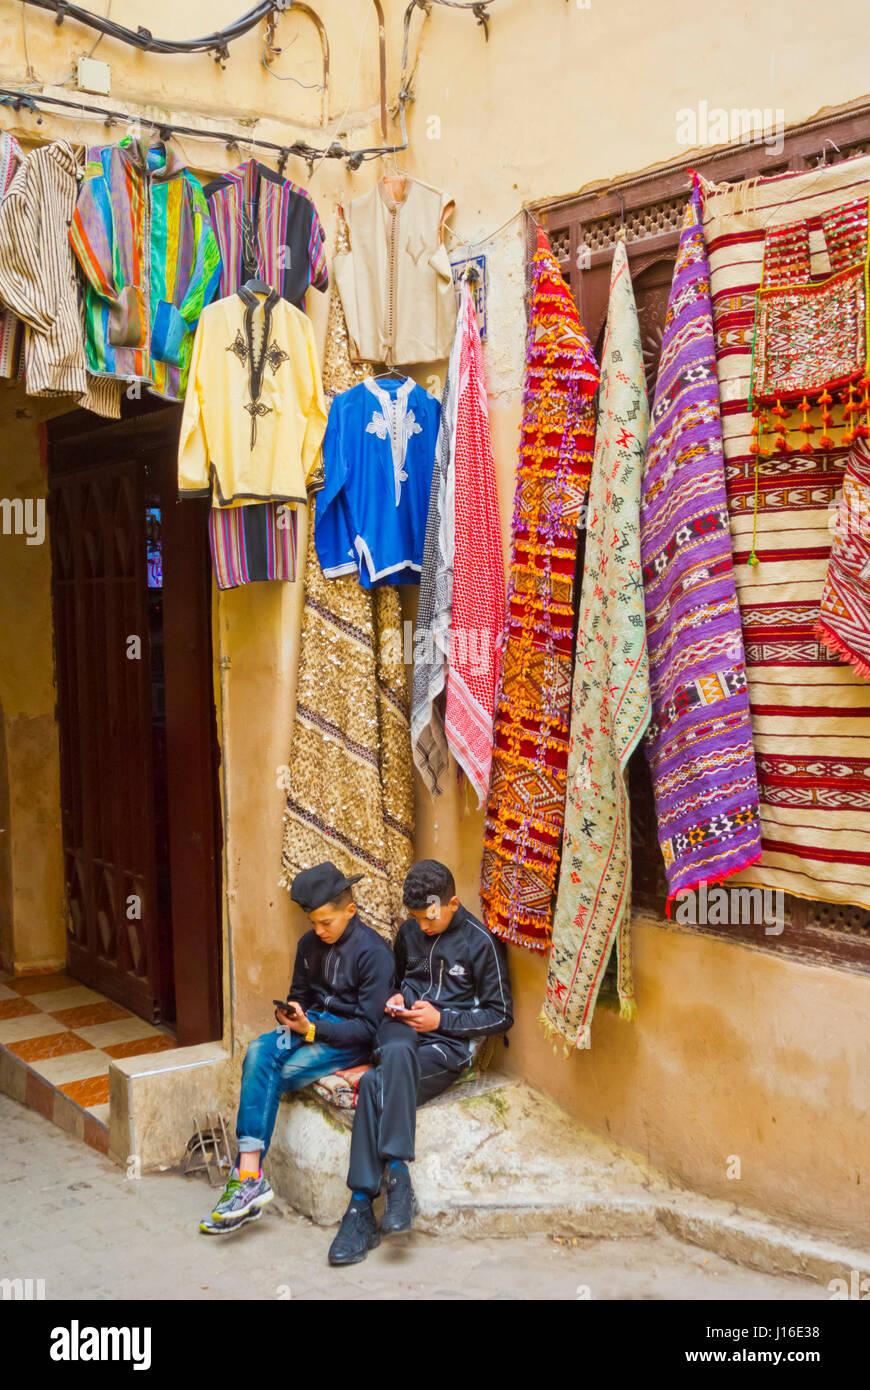 Boys using smartphones, Rue Talaa Seghira, Fes el-Bali, Medina, Fez, Morocco, Africa - Stock Image